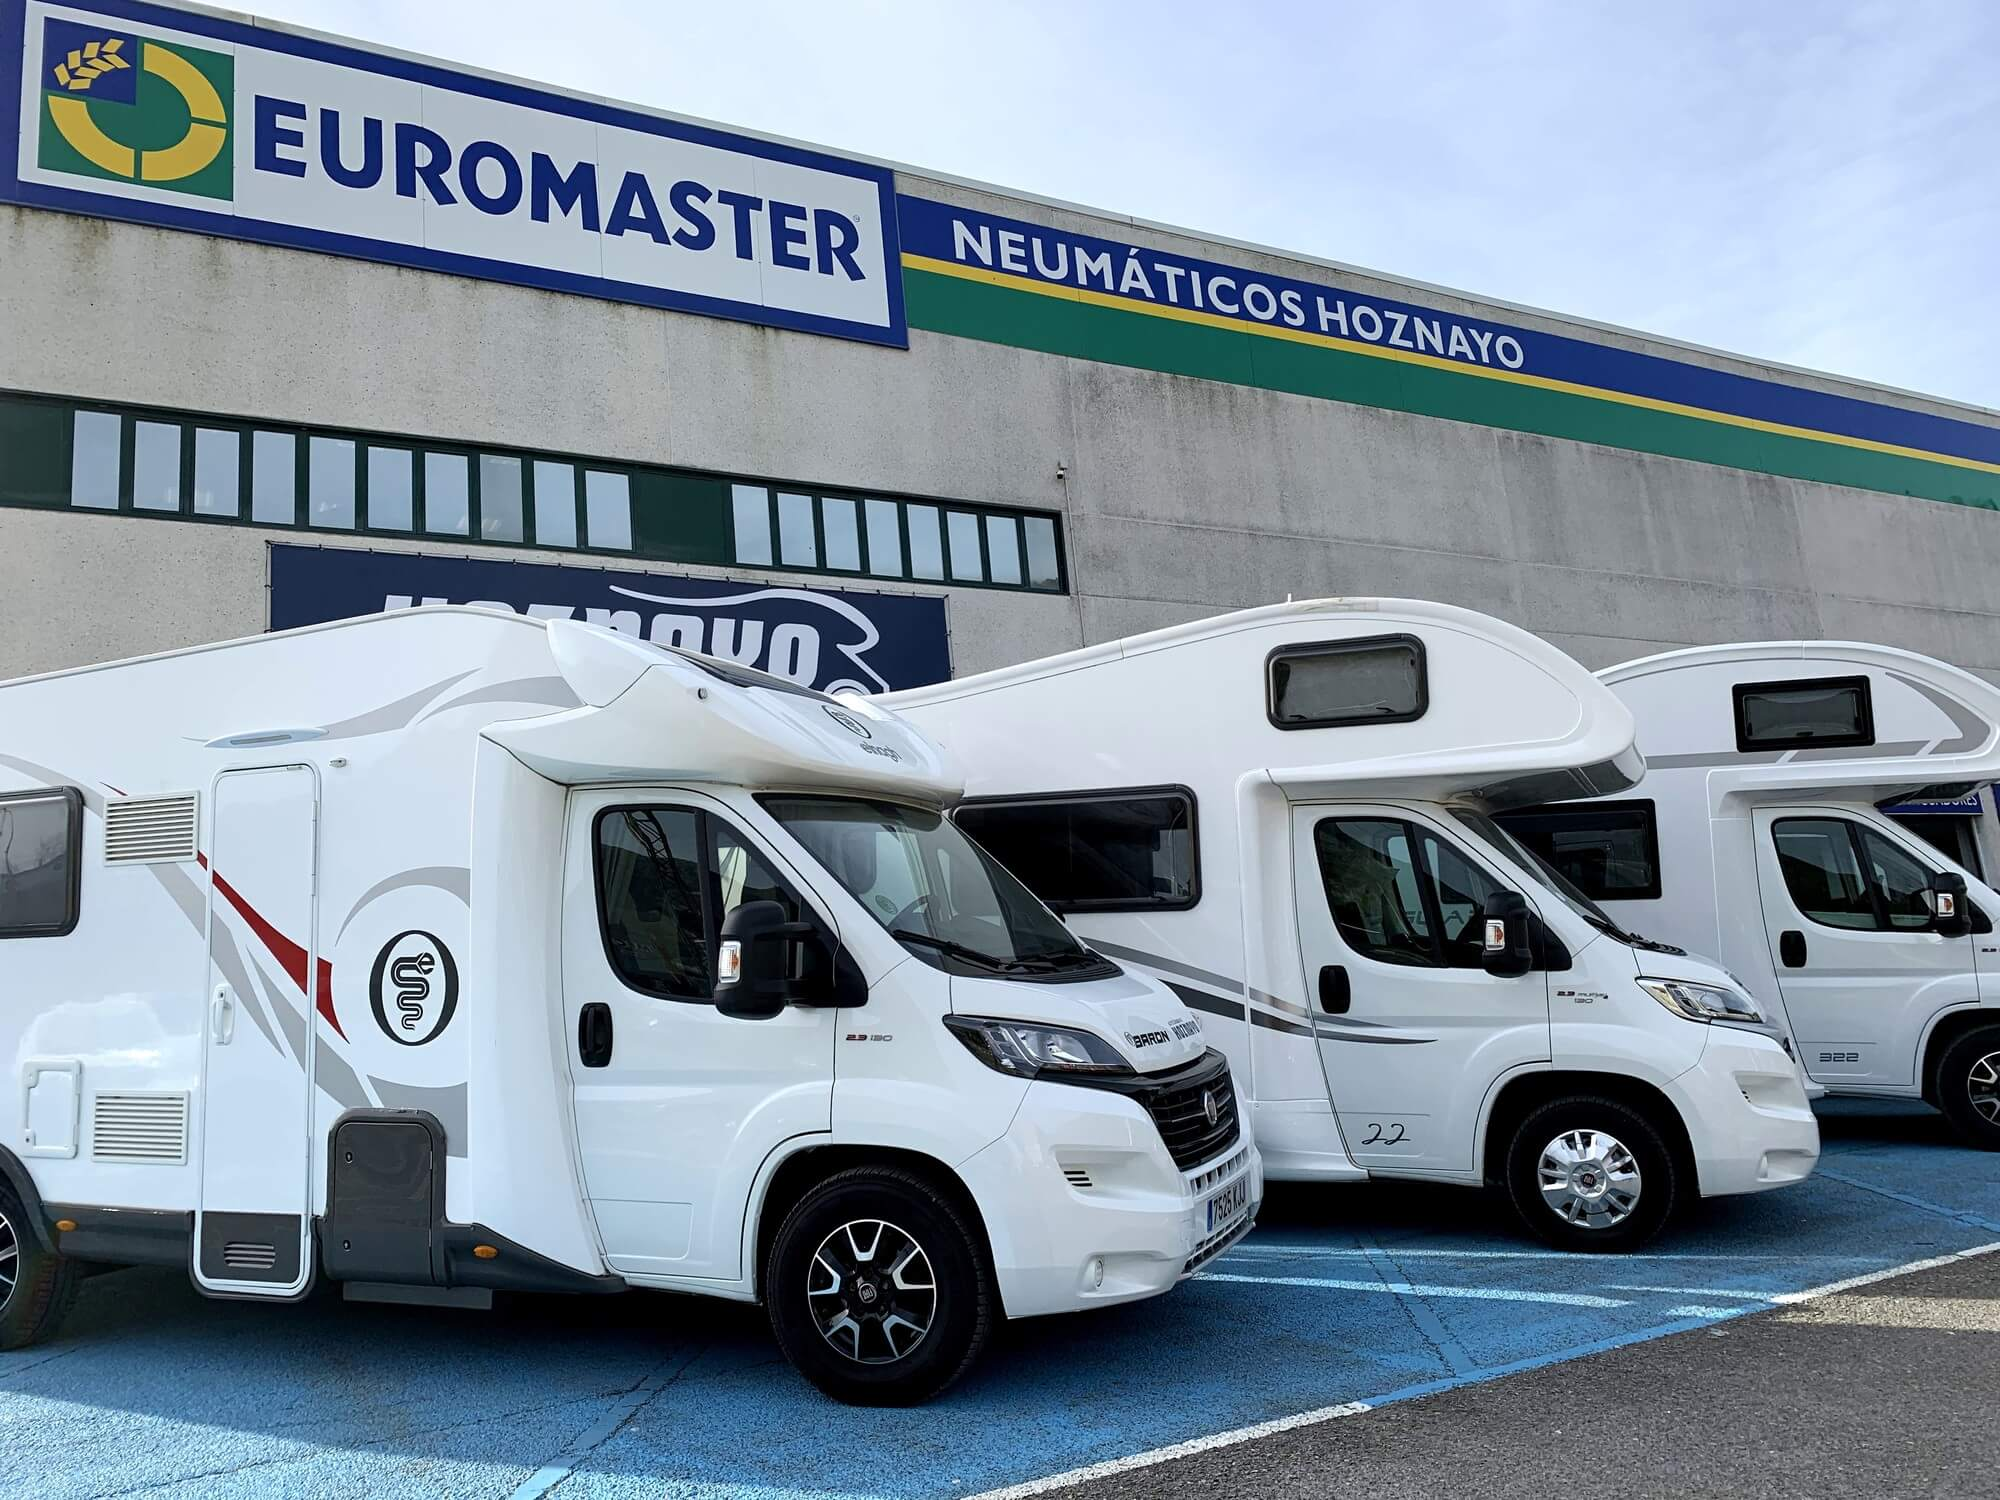 Alquilar caravanas baratas Burgos